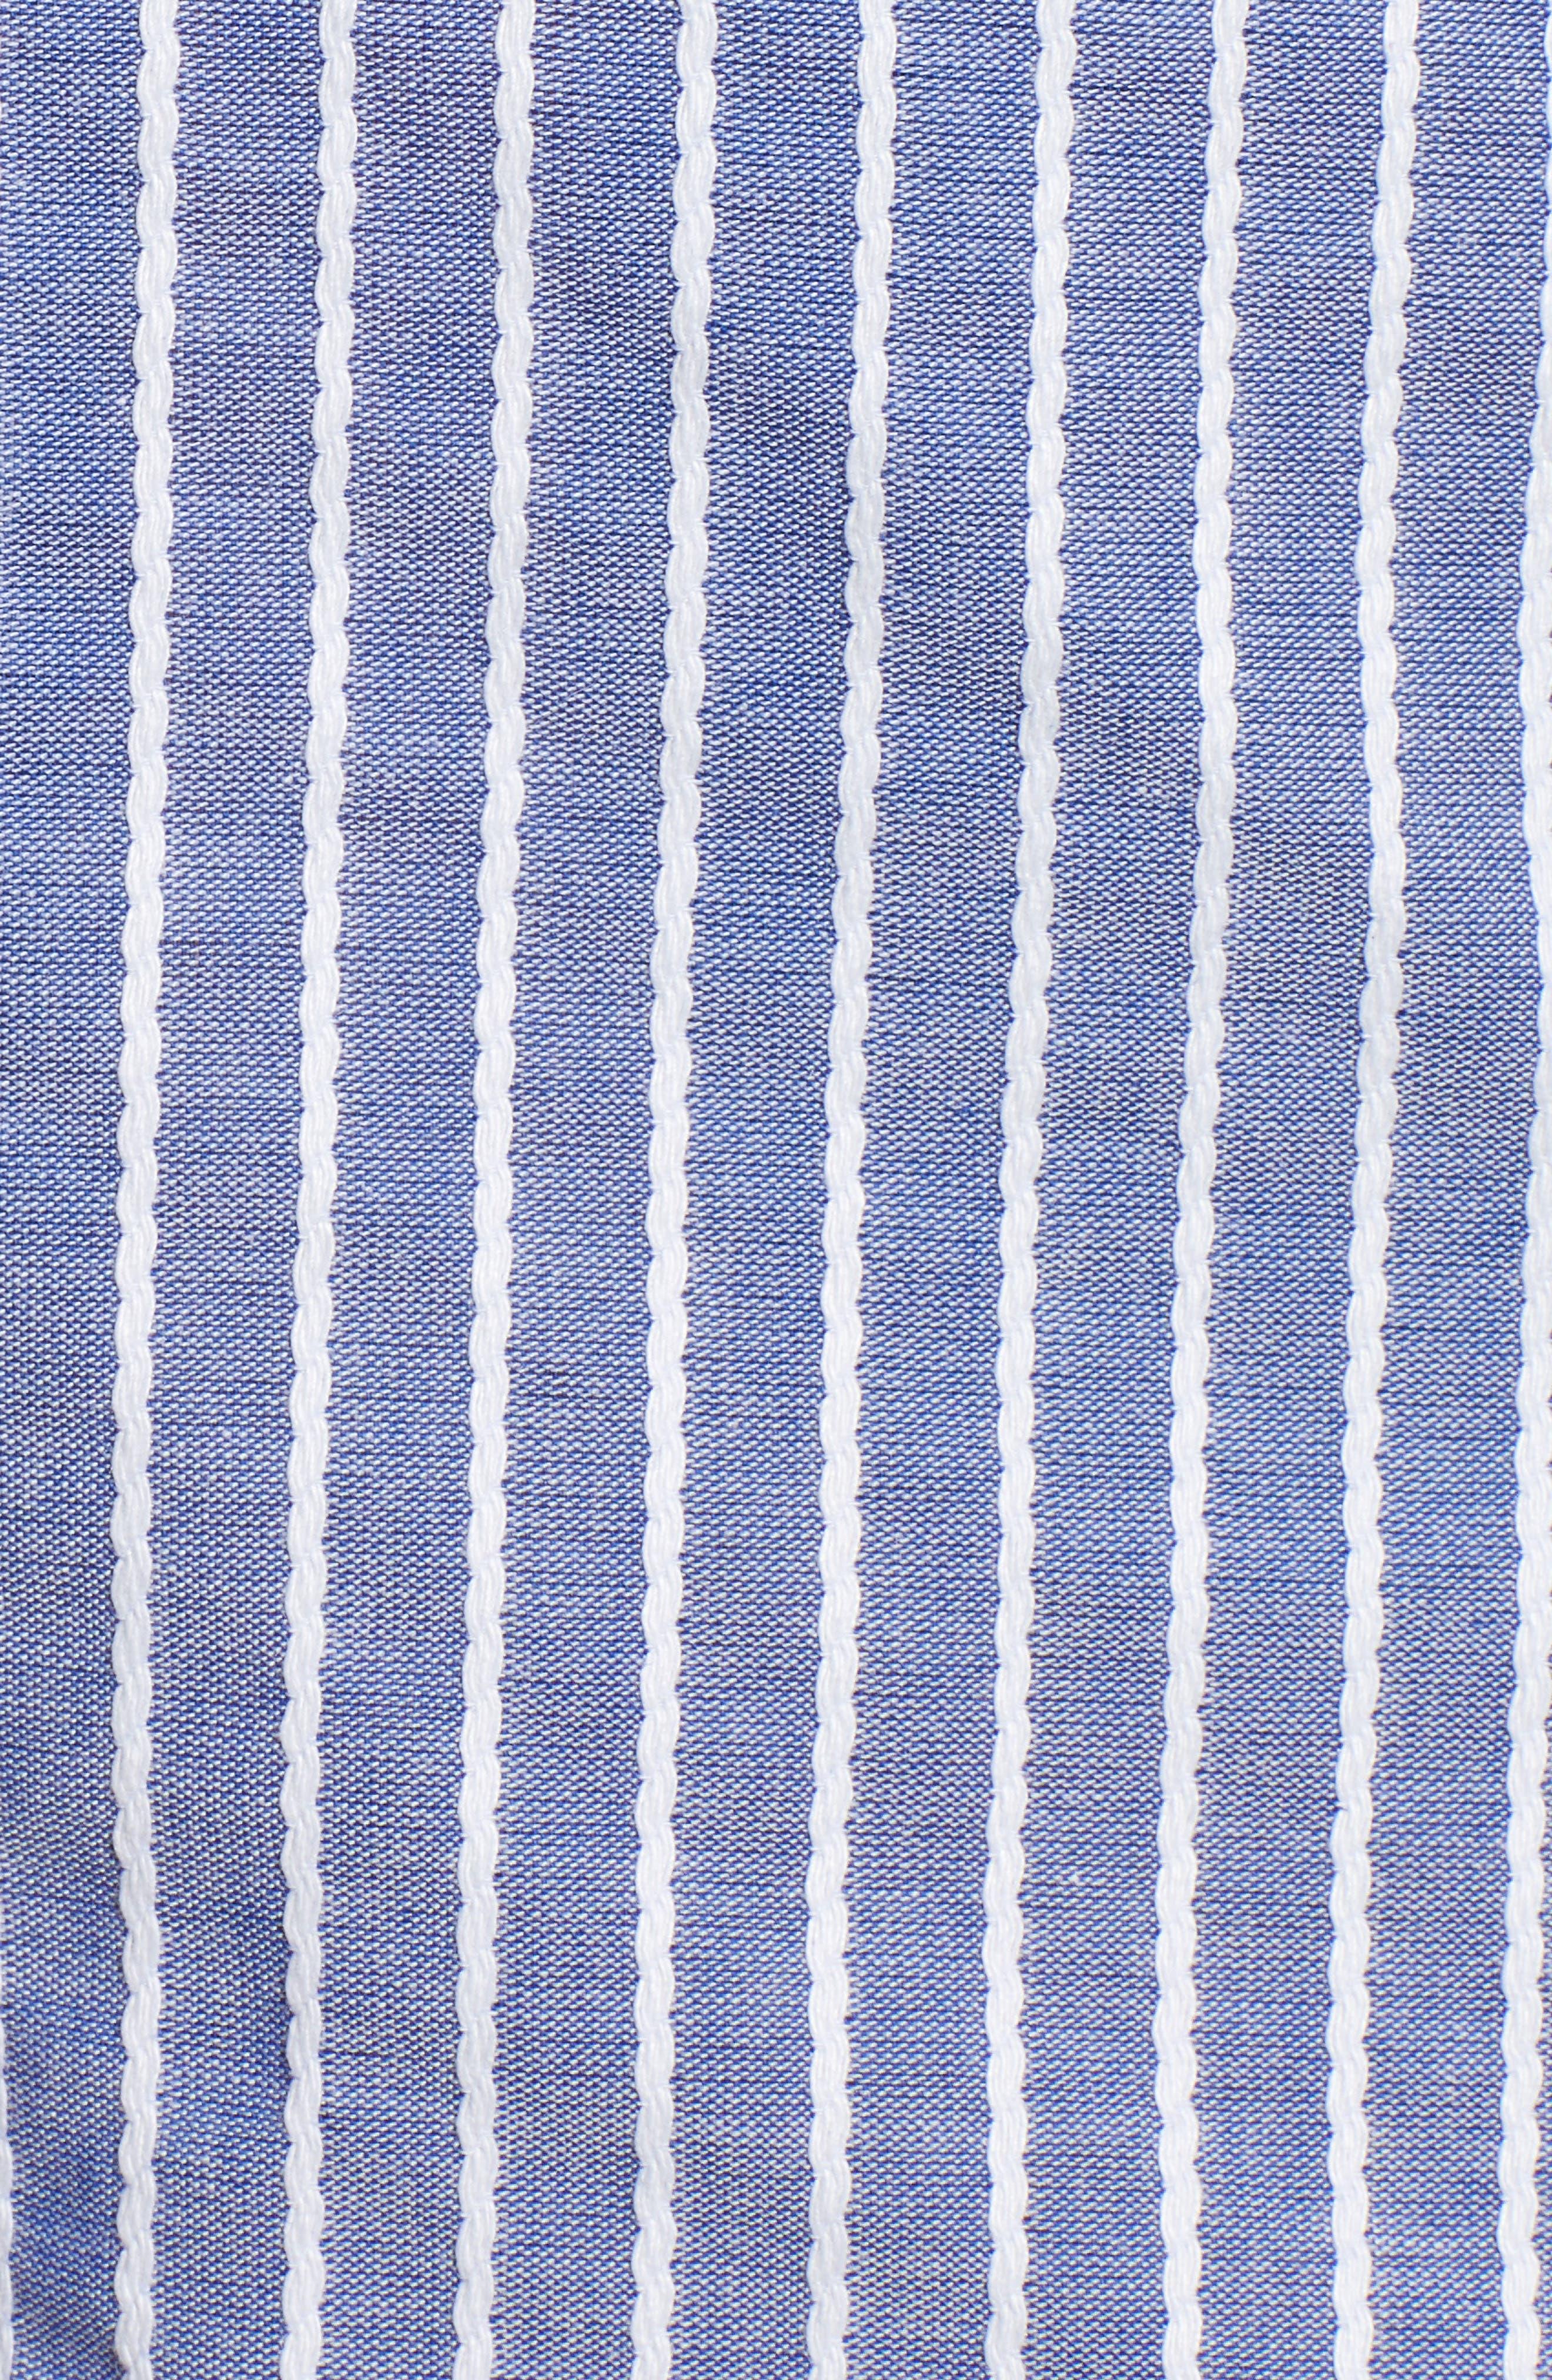 Parcel Ruffle Detail Shorts,                             Alternate thumbnail 5, color,                             400